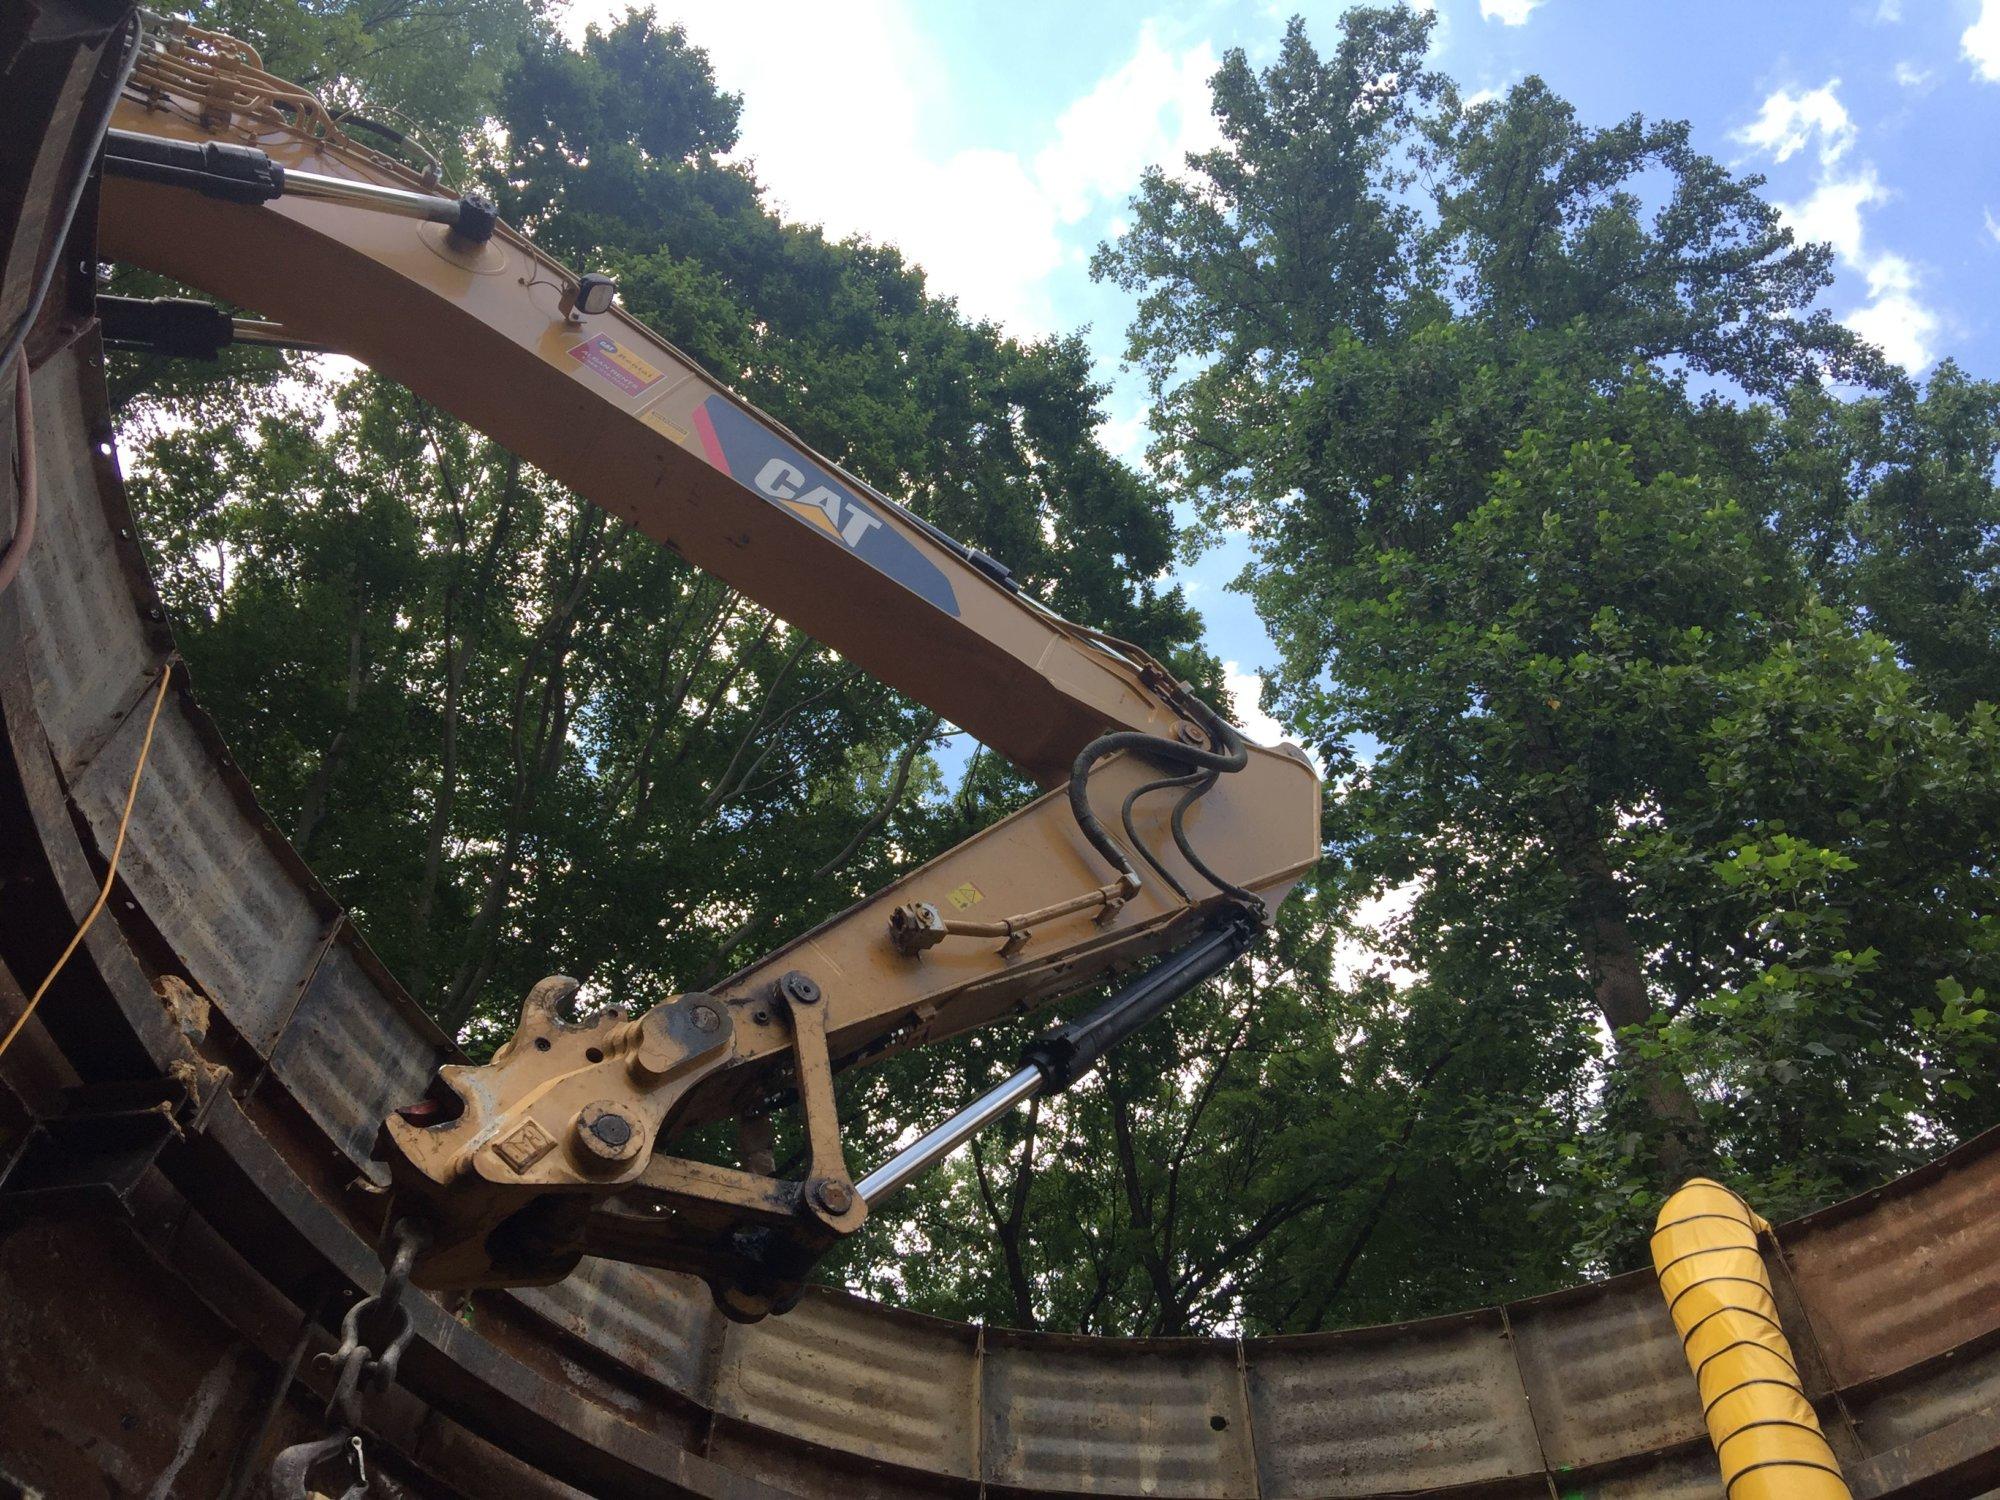 GW Parkway construction